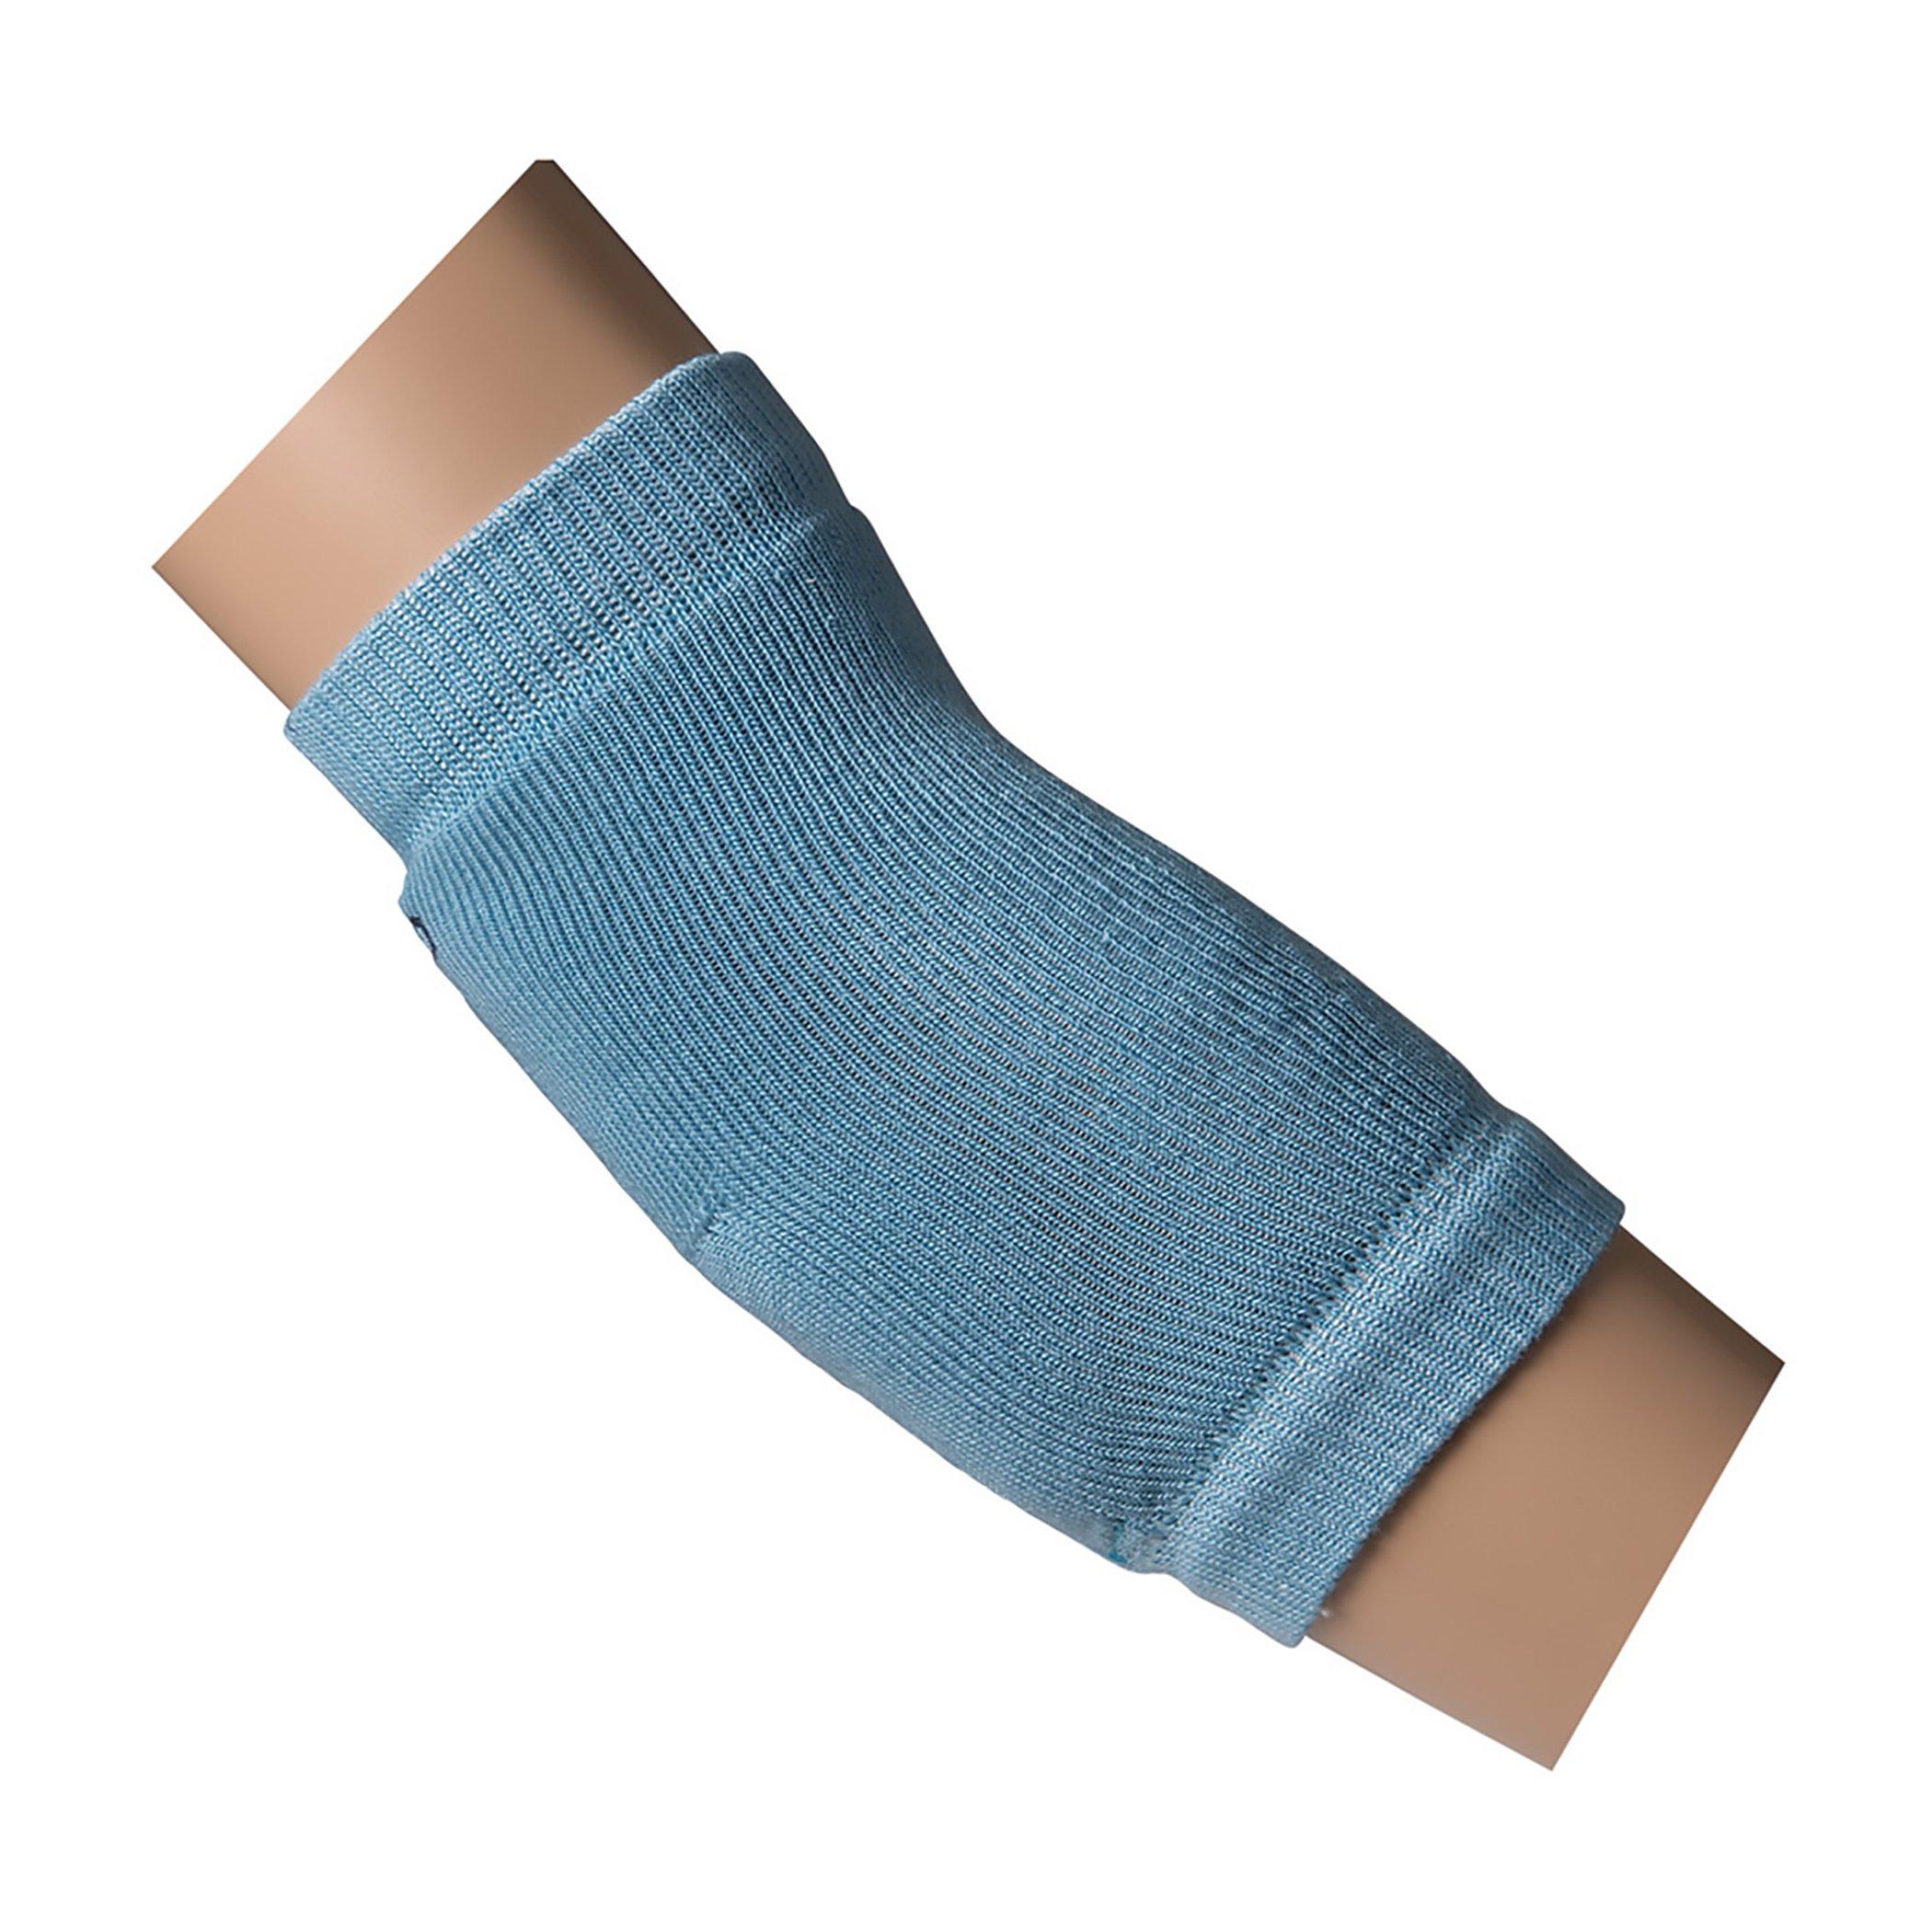 Heelbo Heel/Elbow Protection Sleeve , D 12038, Blue Medium - Case of 12